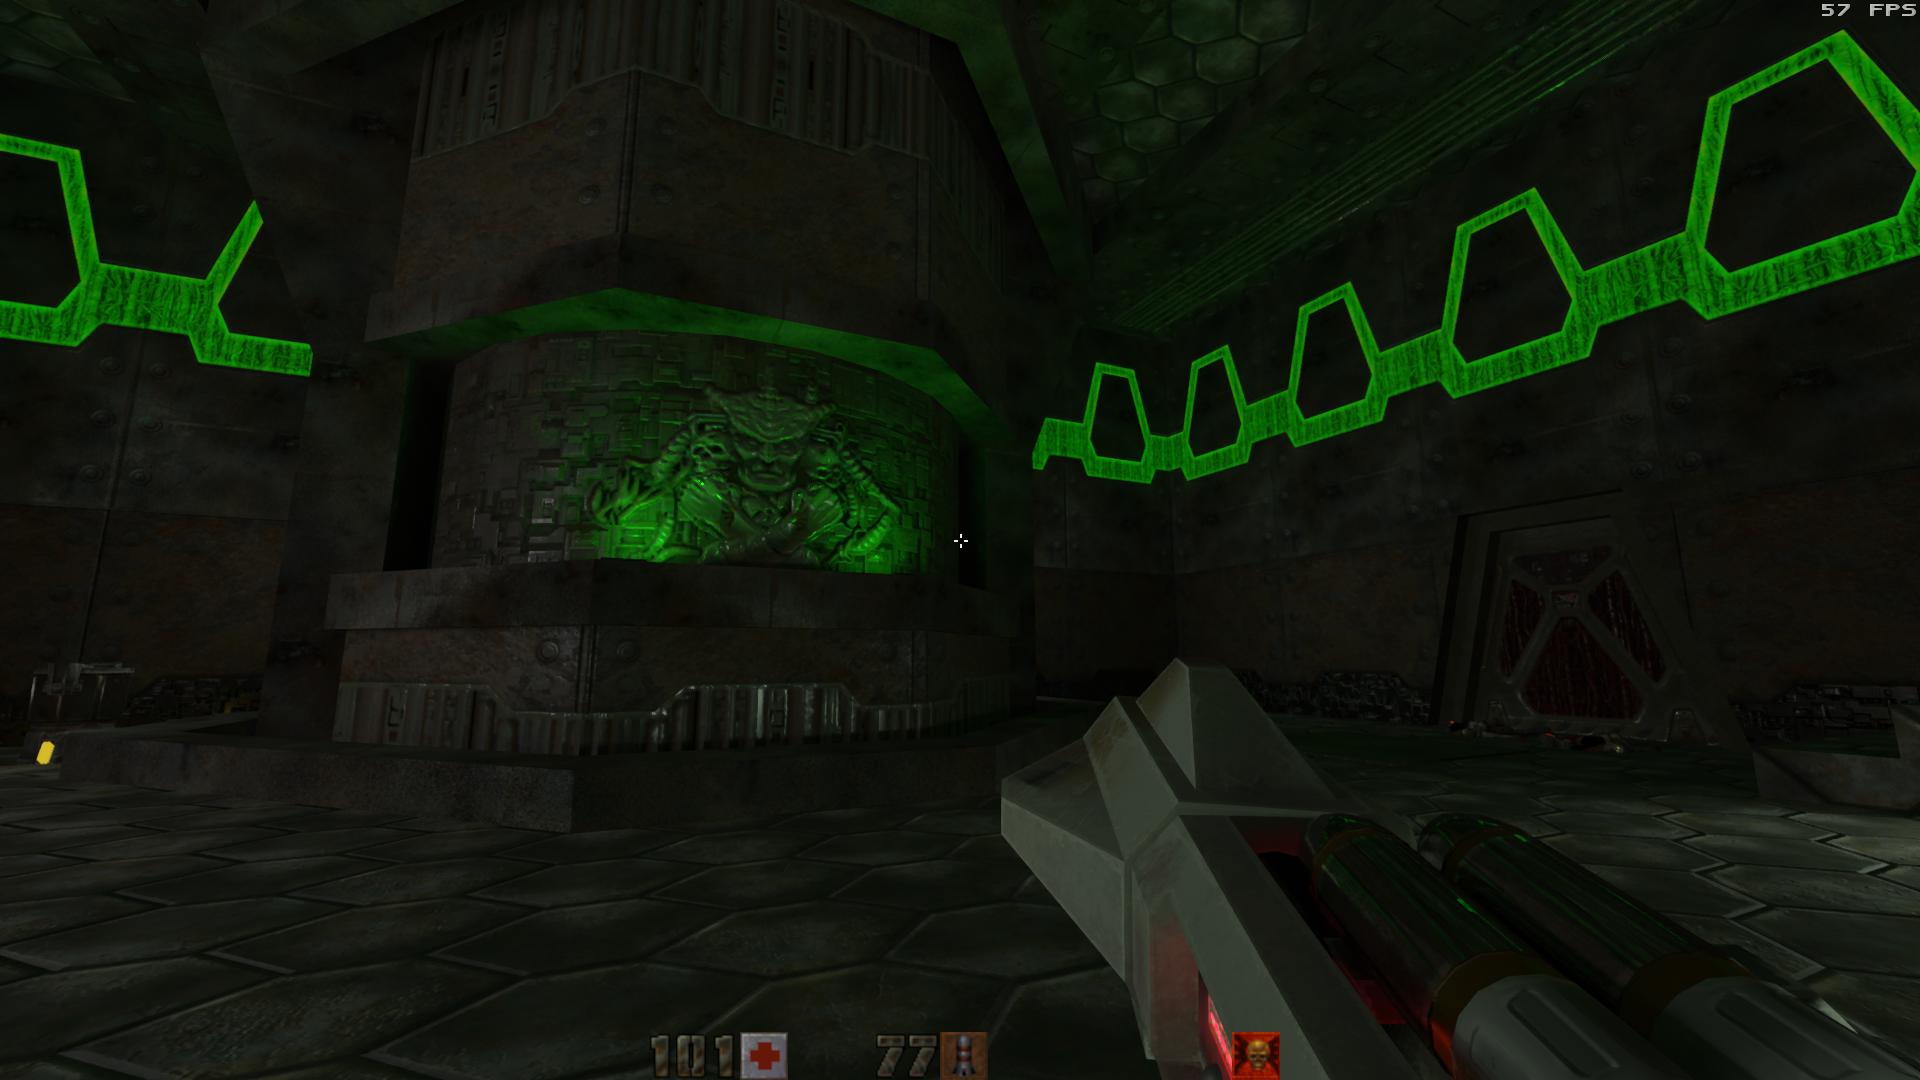 Quake 2 RTX Remaster Screenshot 2019.11.28 - 19.08.33.67.png